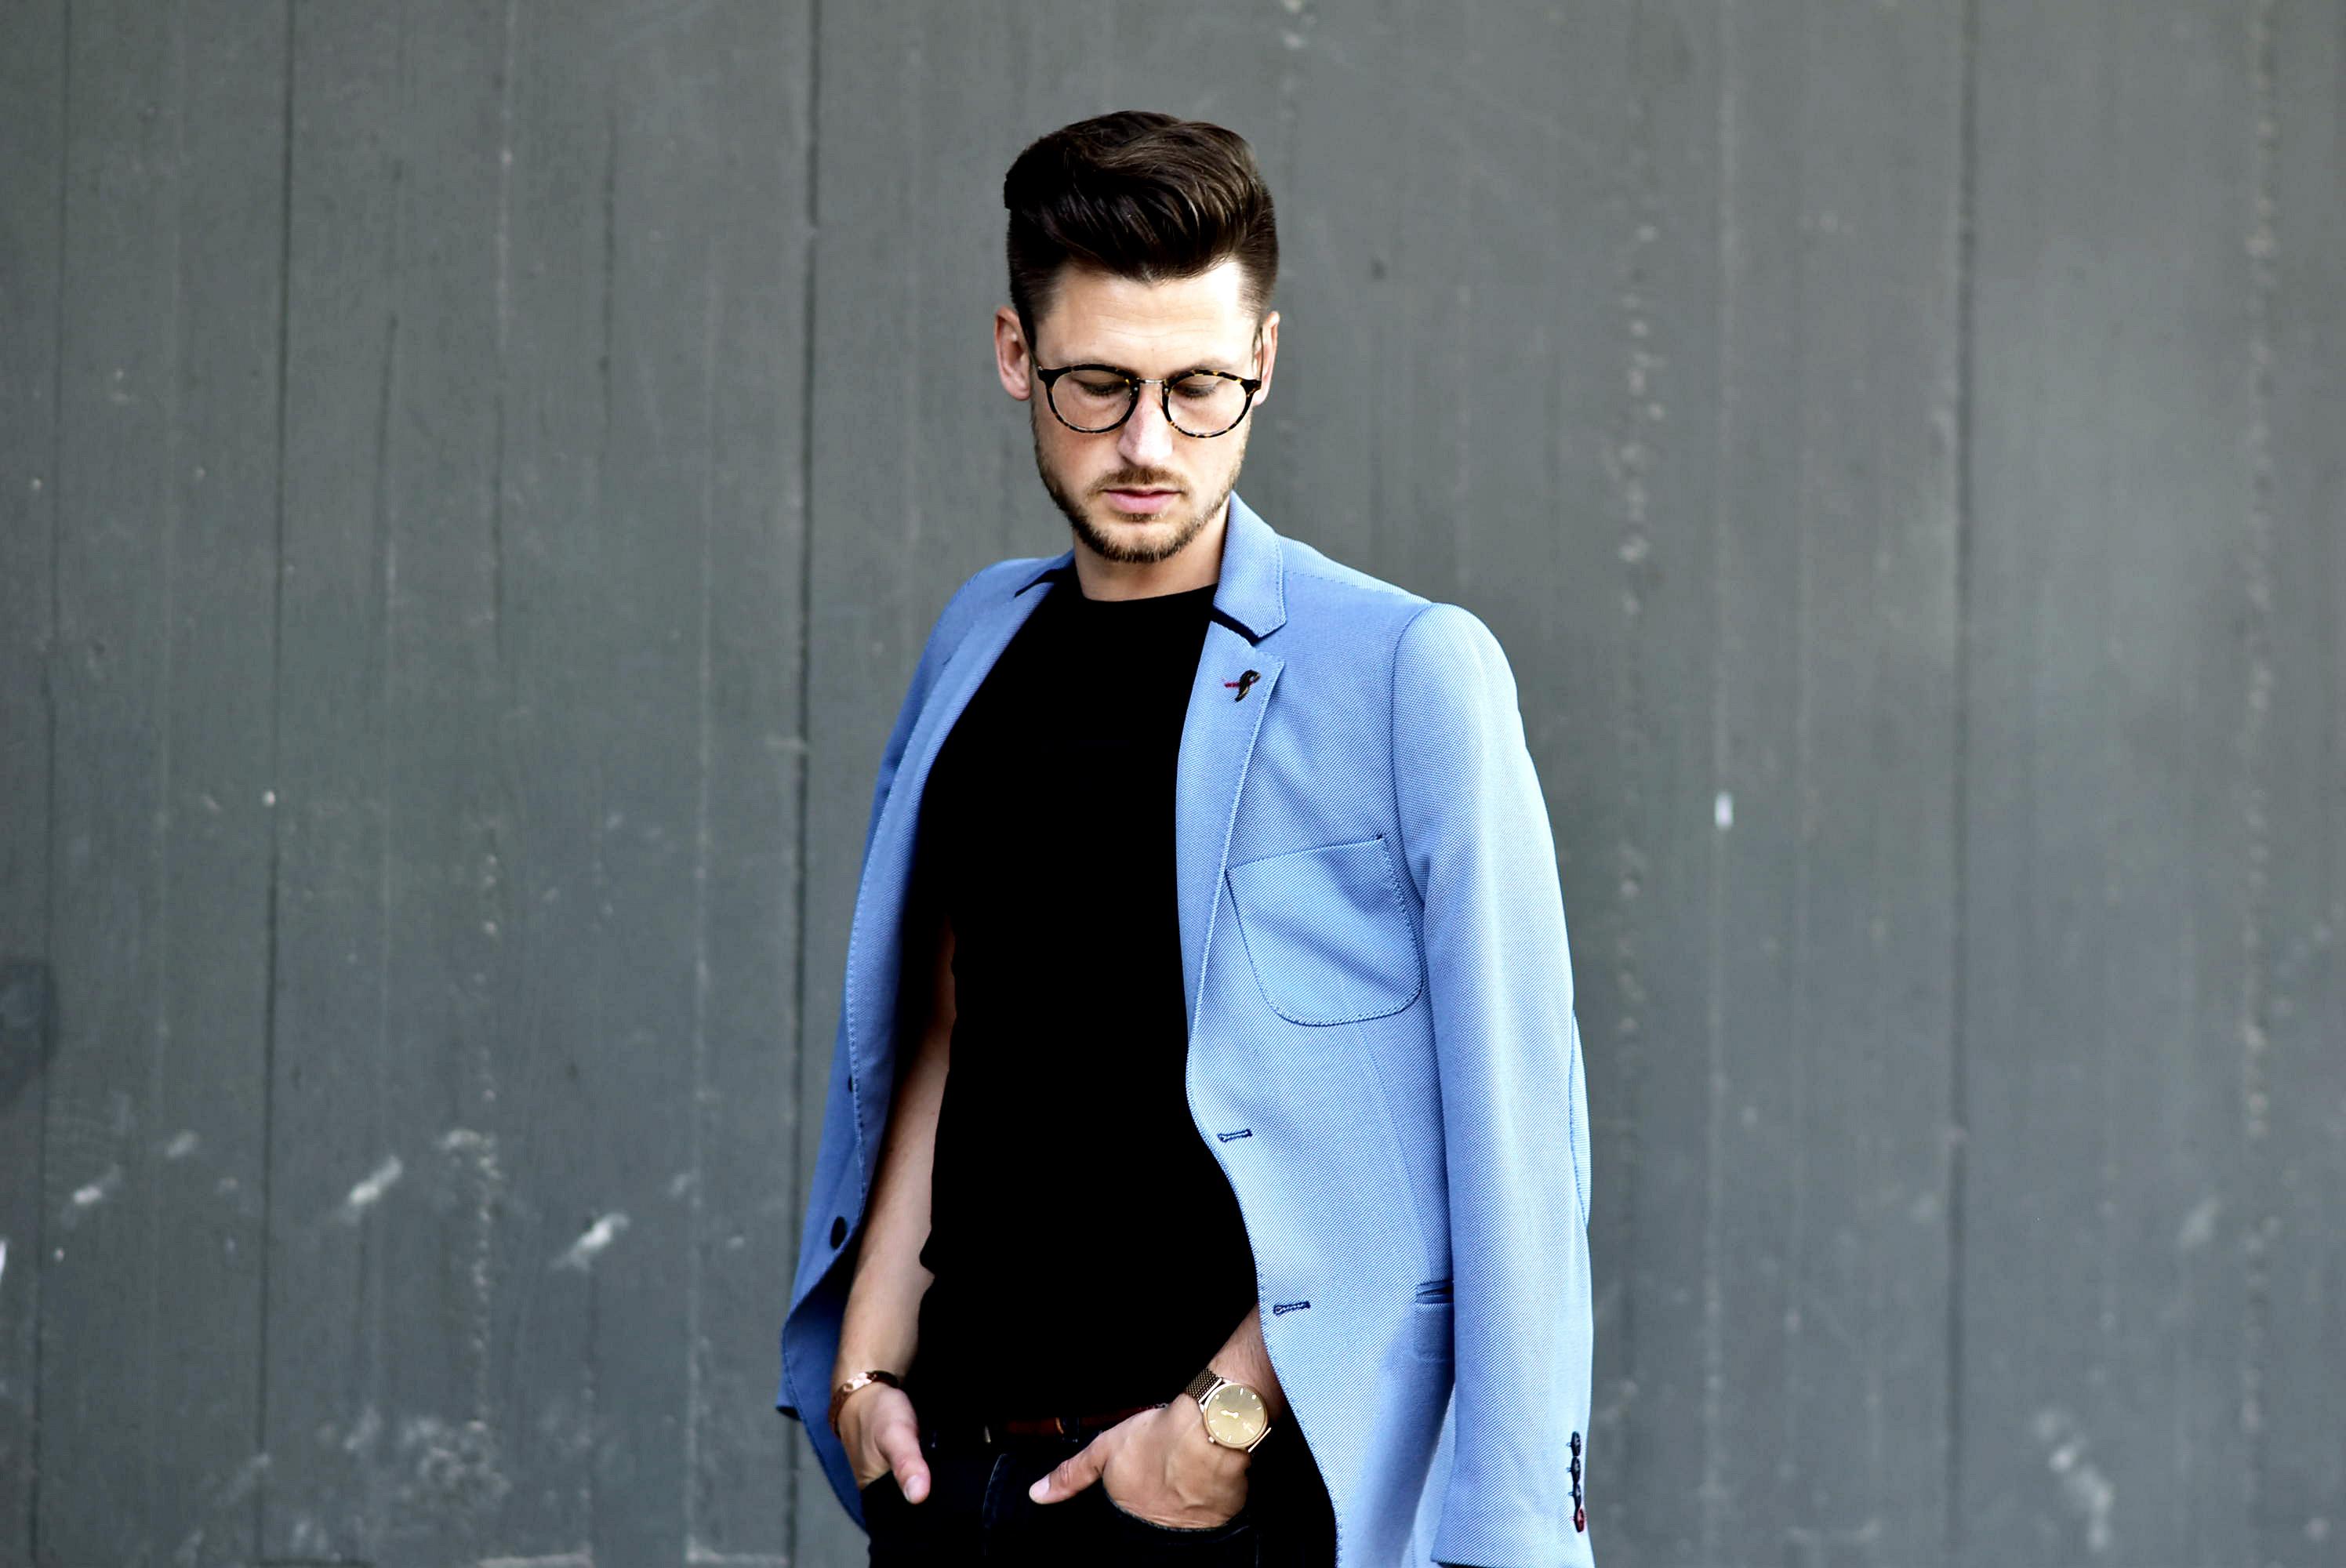 Tommeezjerry-Styleblog-Männerblog-Männer-Modeblog-Berlin-Berlinblog-Outfit-Streetlook-Royalblauer-Blazer-Royalblue-All-Black-Look-Chelsea-Boots-Skinny-Jeans-7